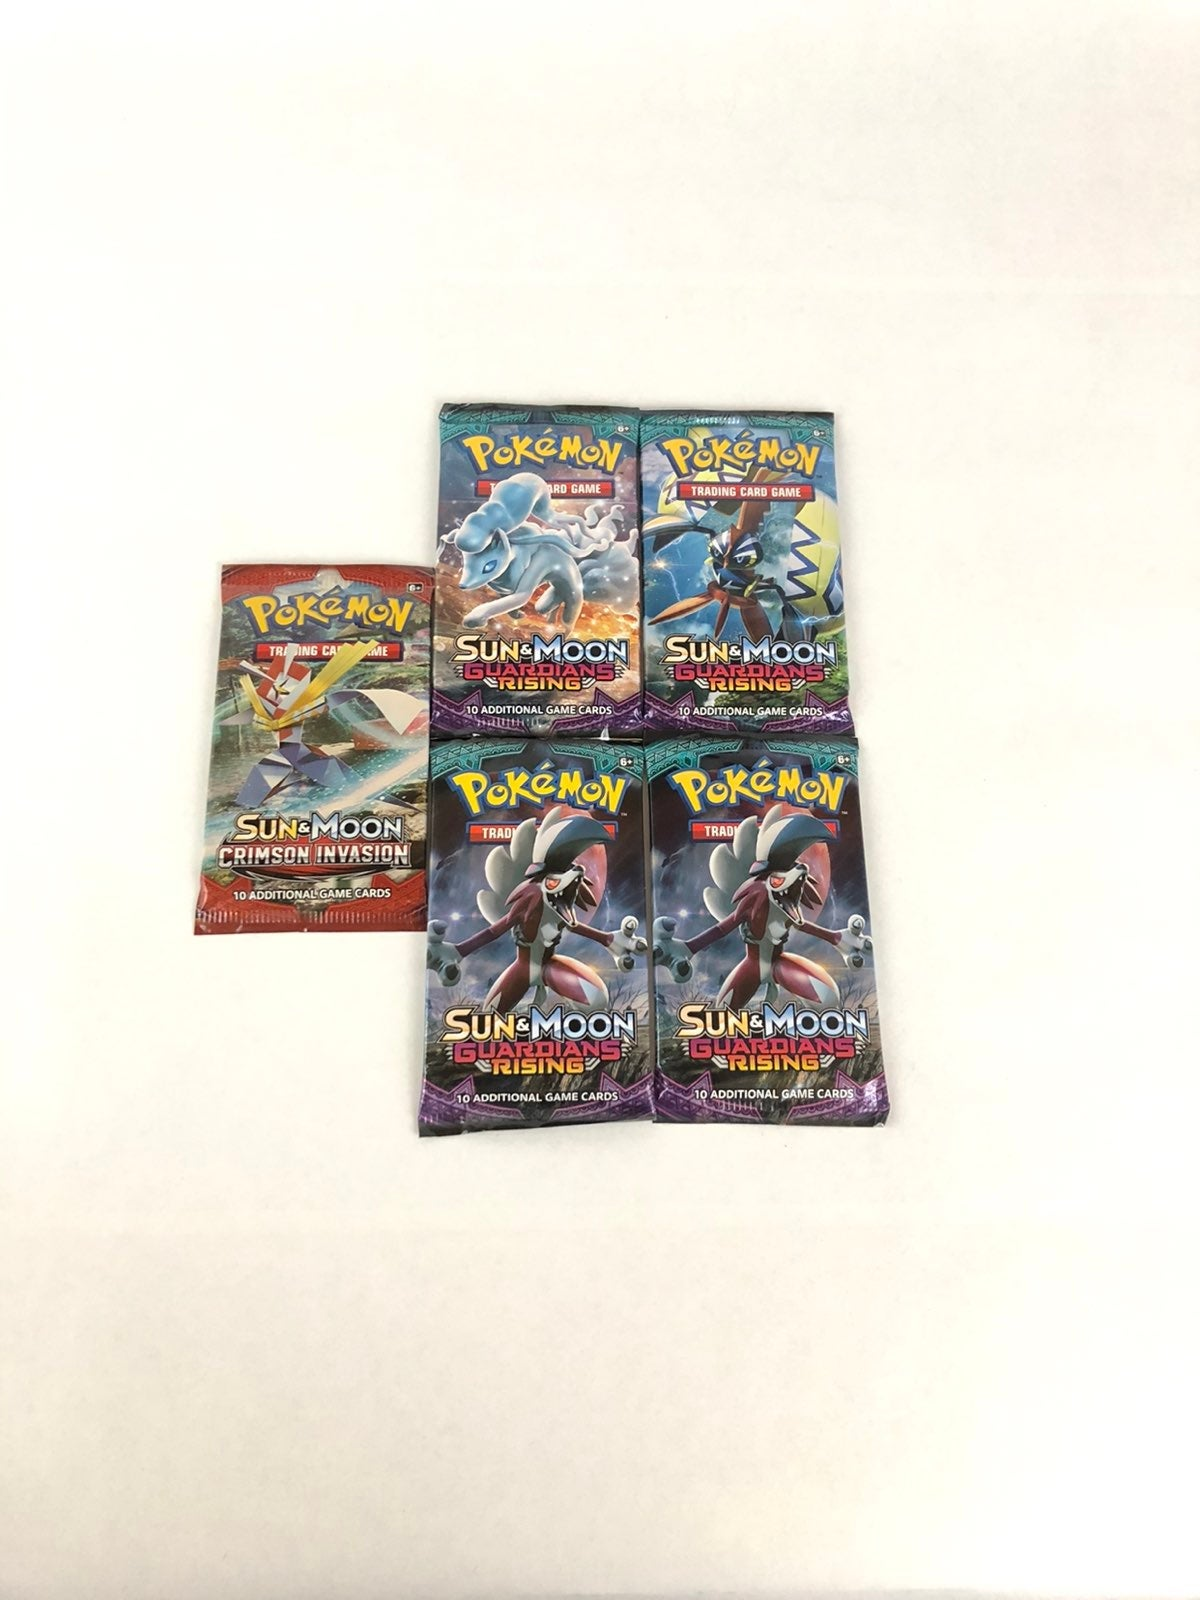 POKEMON 4x Sword And Shield Base BOOSTER PACK Art Set 1 of Each Pack Art